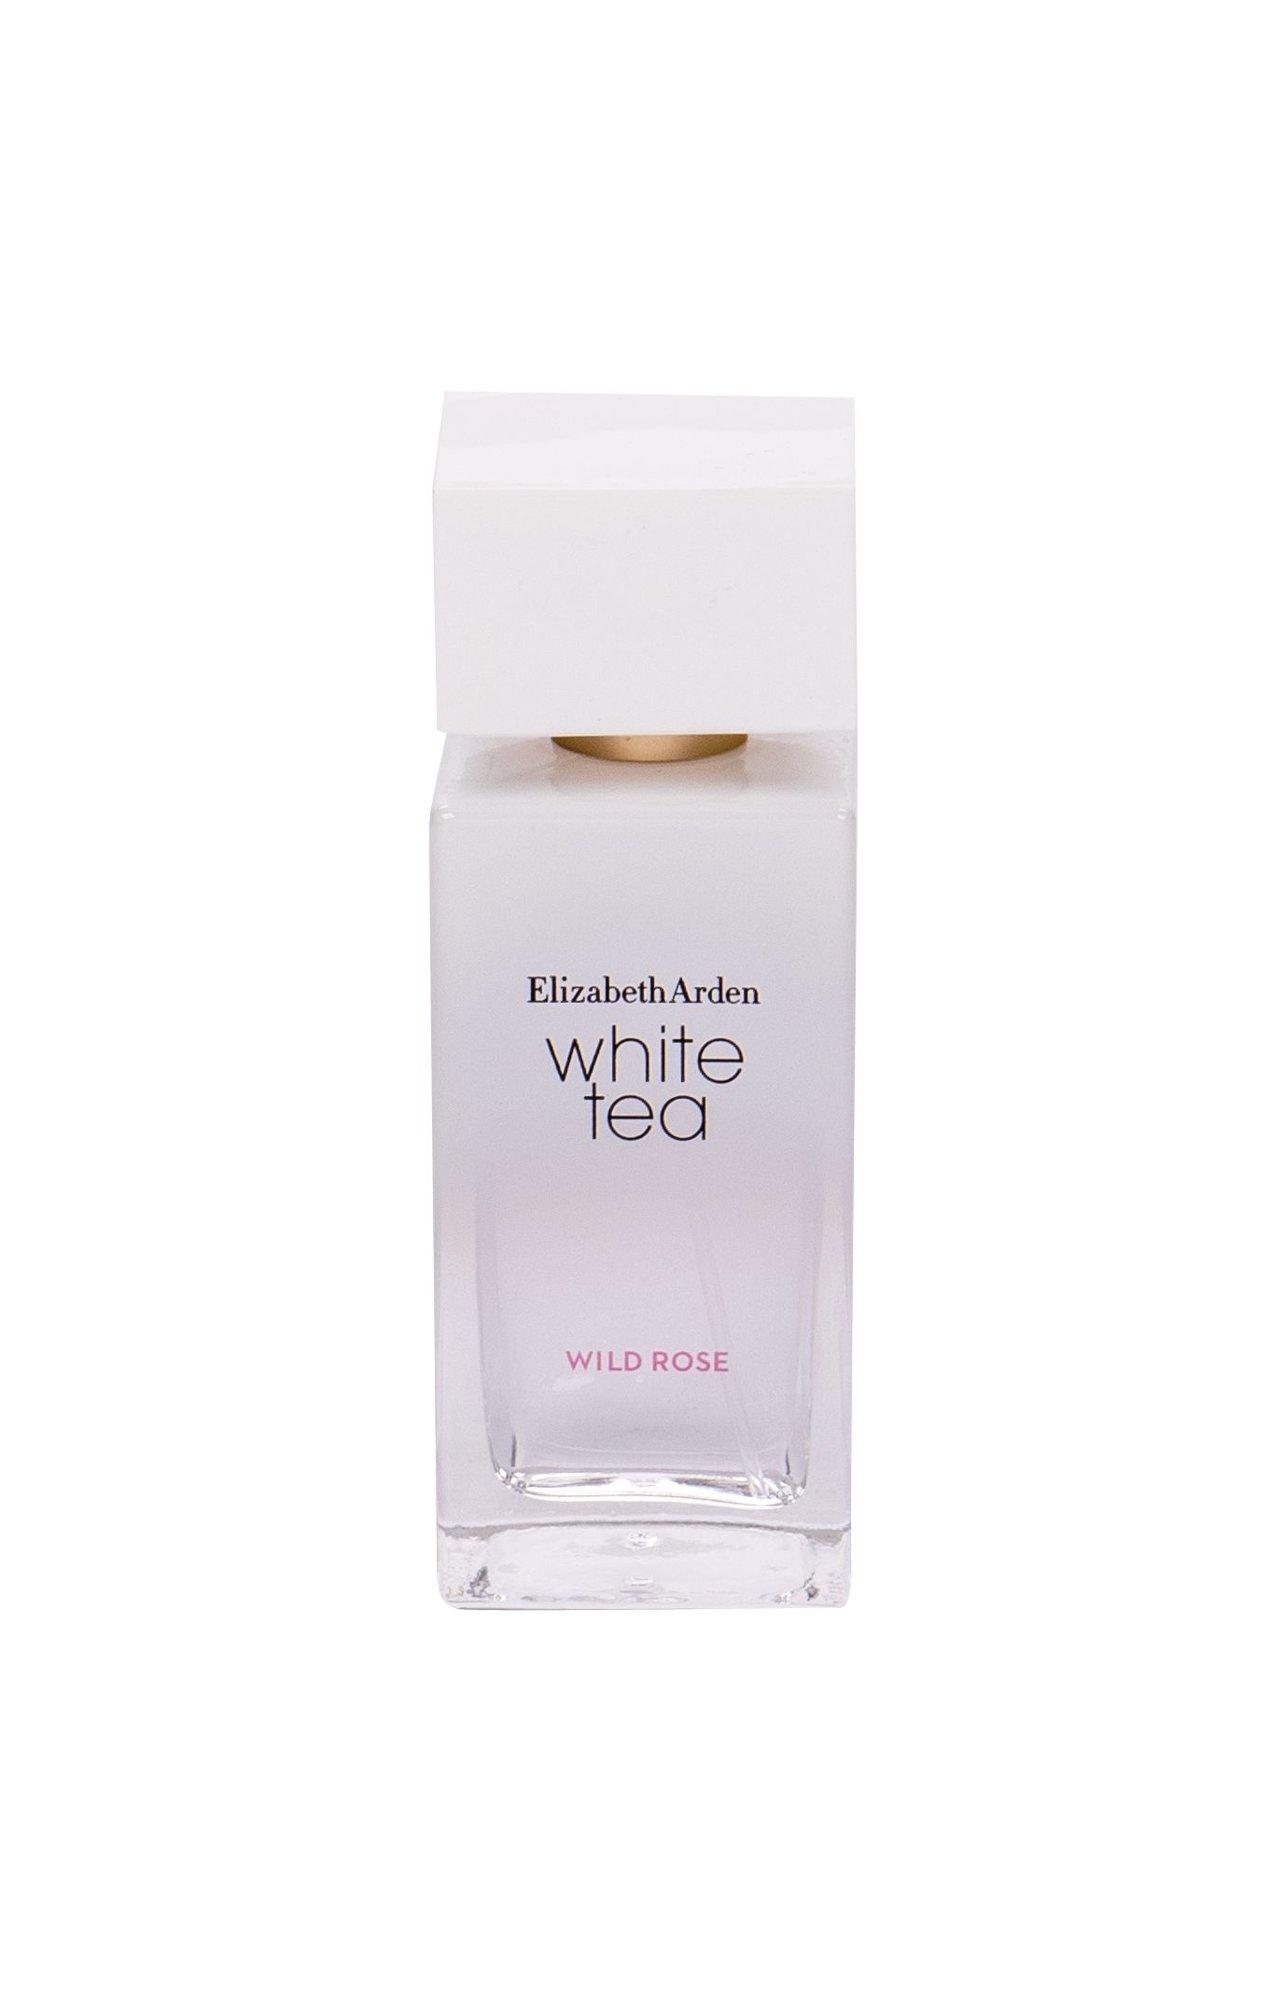 Elizabeth Arden White Tea Wild Rose - toaletní voda W Objem: 100 ml